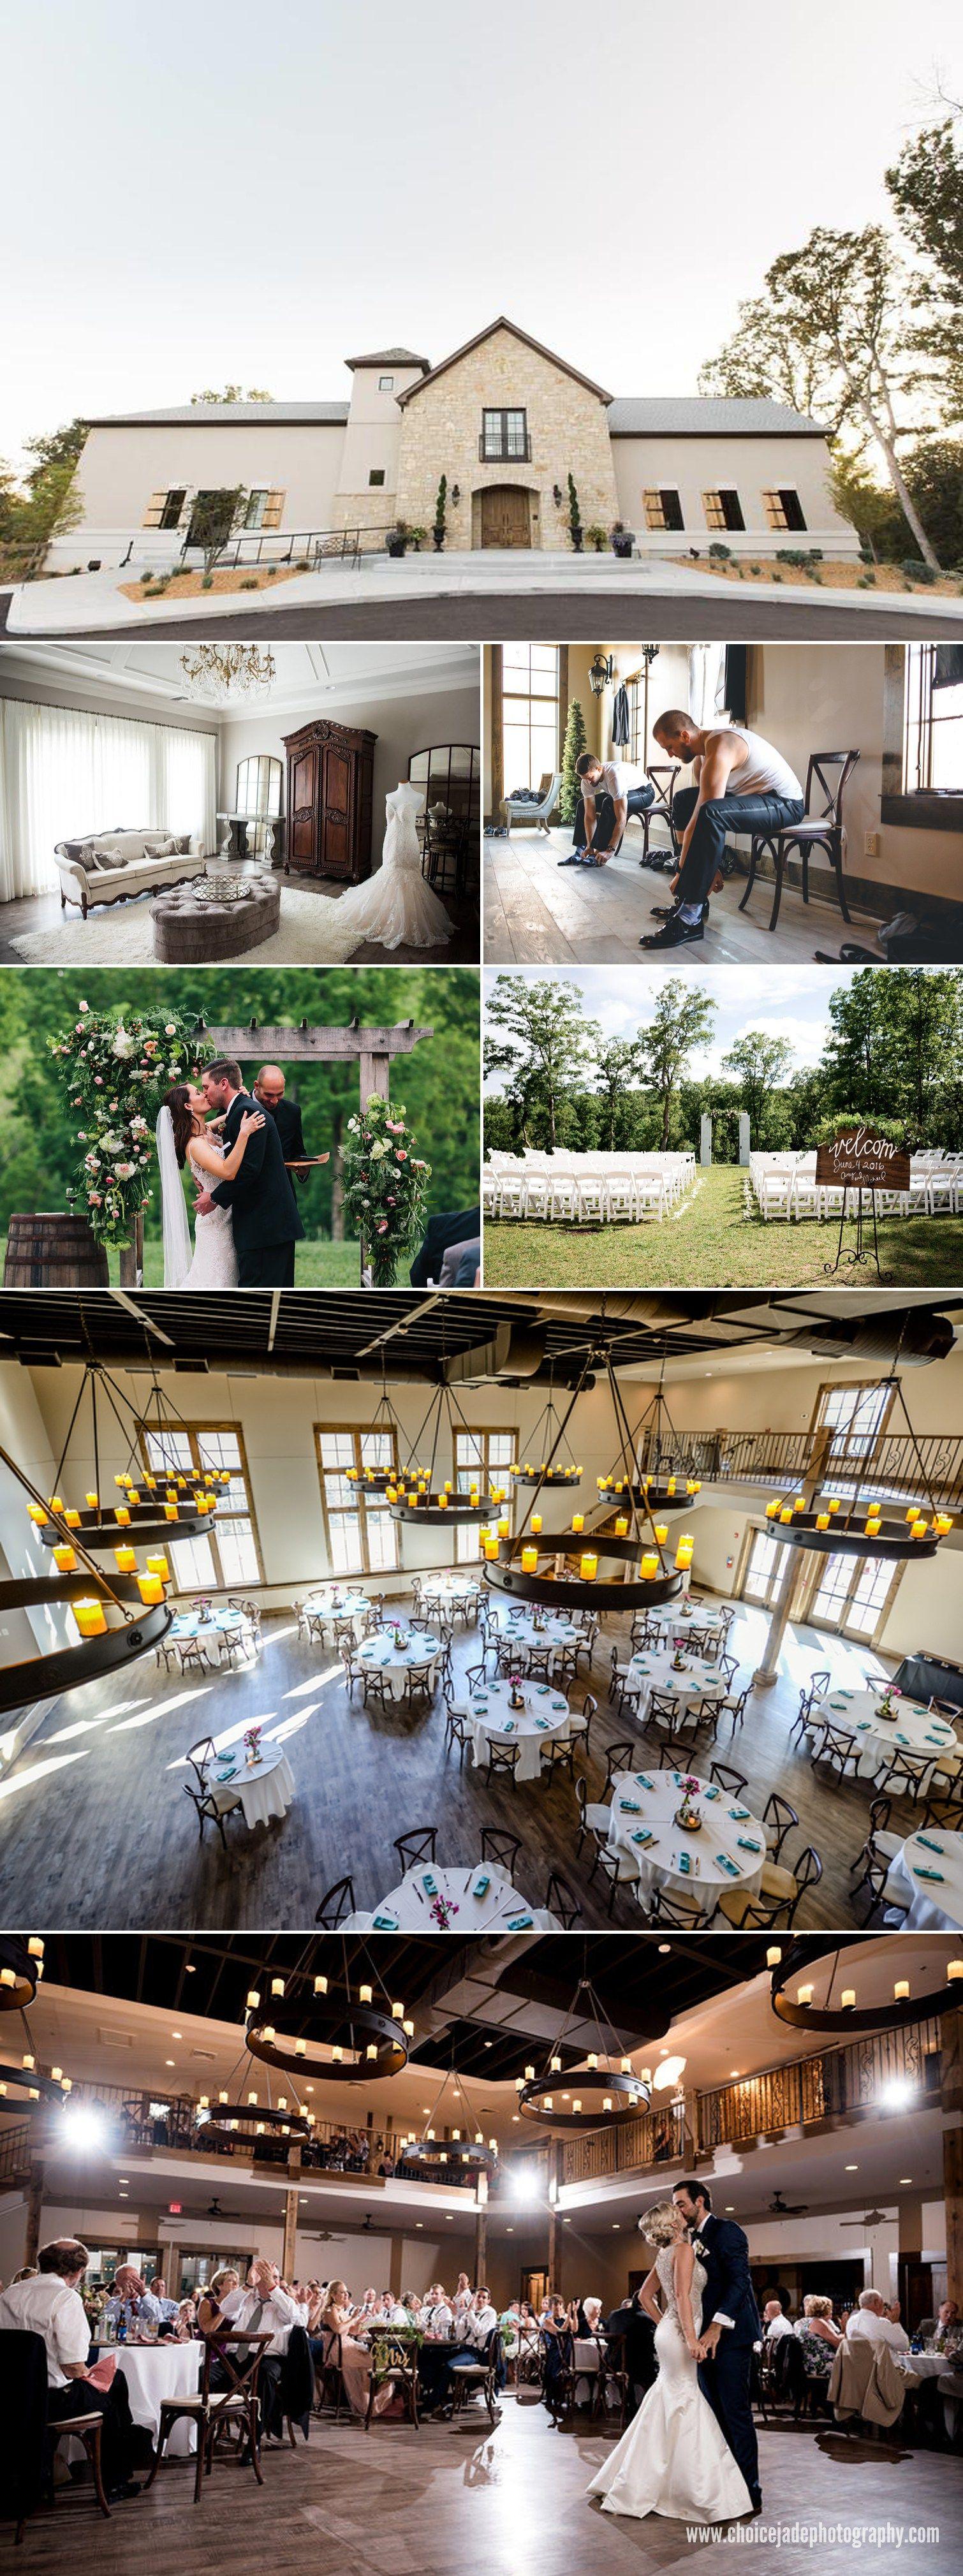 5 Amazing New Wedding Venues In St Louis Wedding Venues Yosemite Wedding Venues